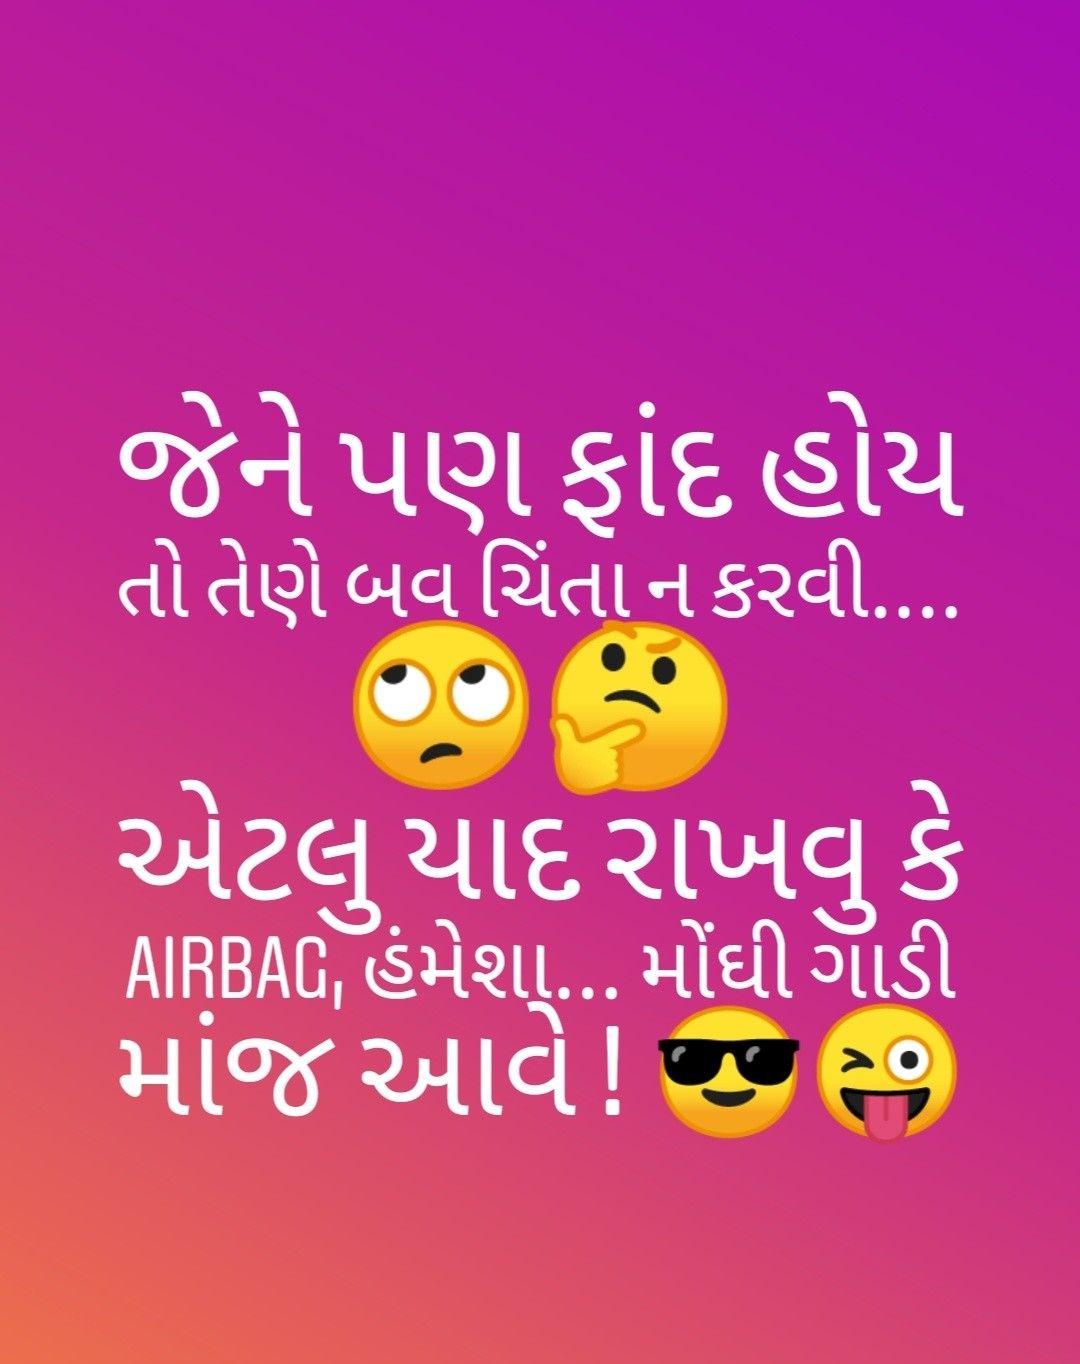 Gujarati Funny Quotes Sk Funny Quotes Gujarati Quotes Status Quotes